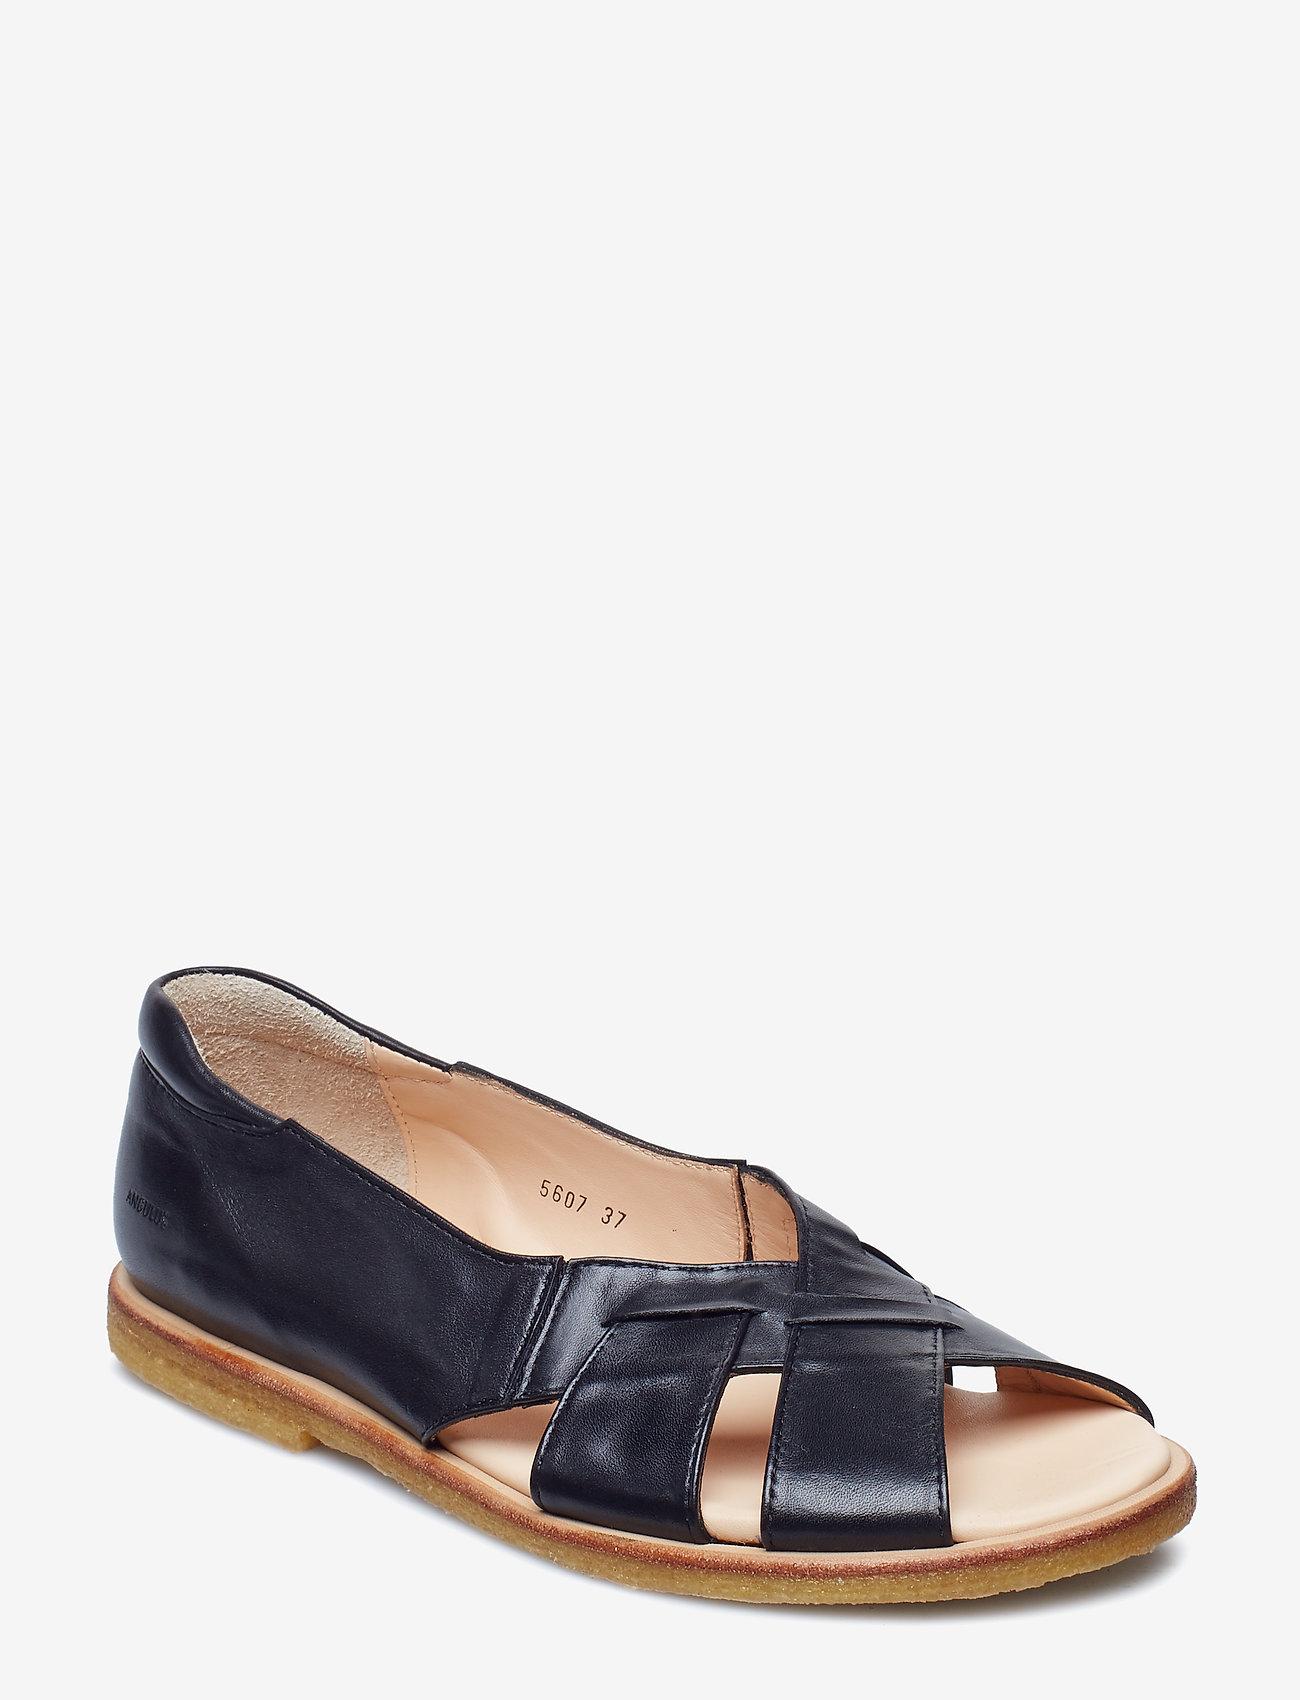 ANGULUS - Sandals - flat - open toe - op - platta sandaler - 1604/001 black/black - 0